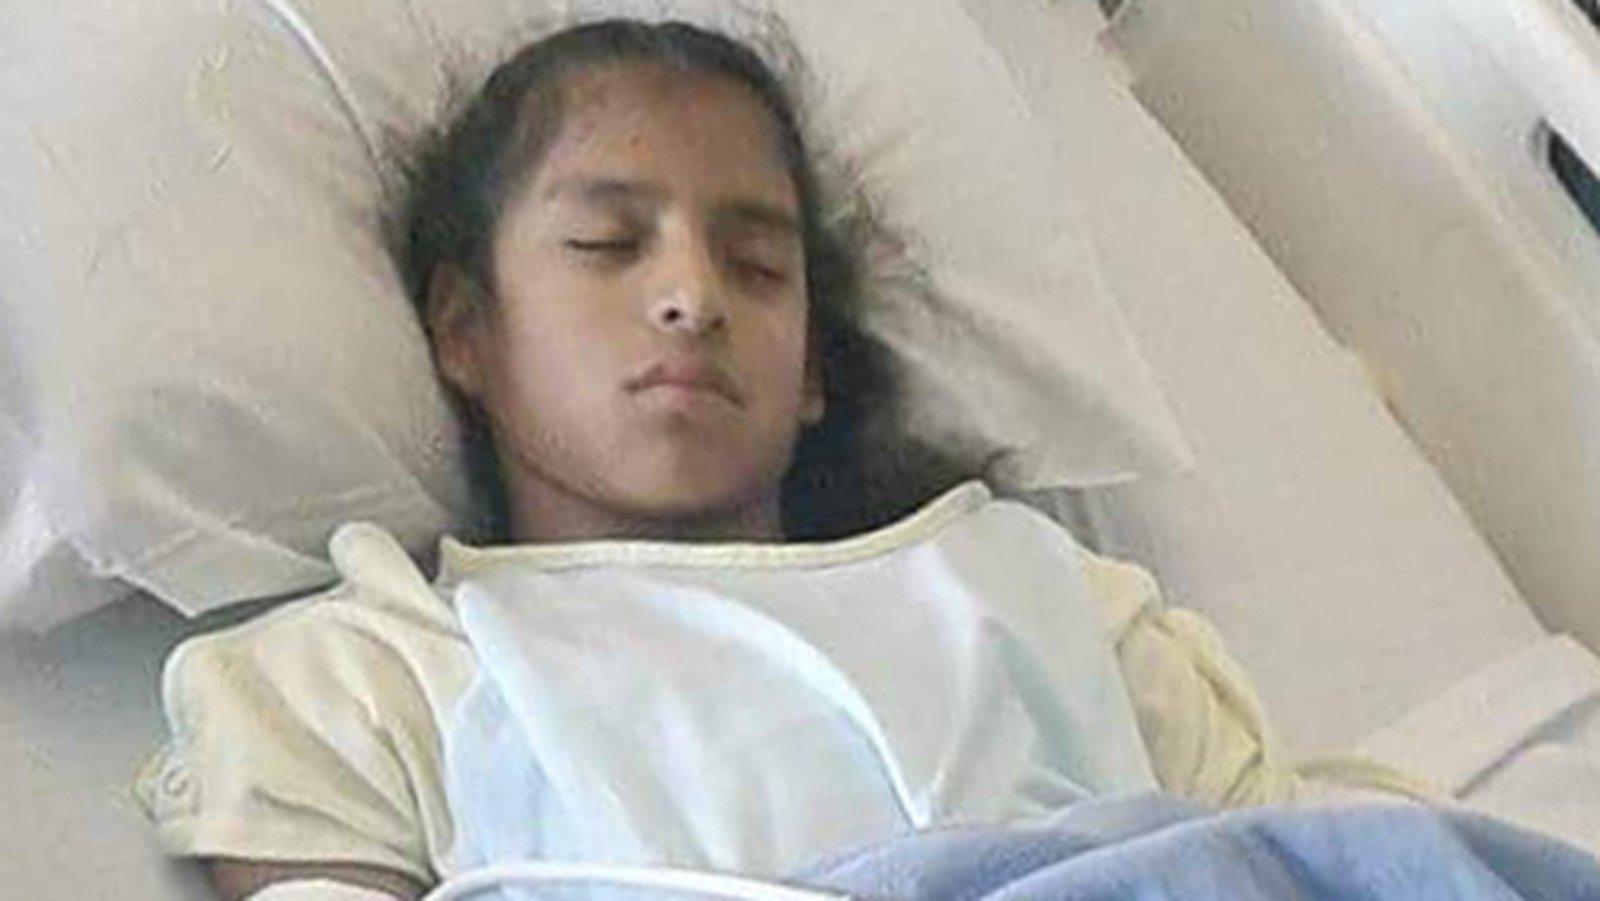 Rosa Maria Hernandez, cerebral palsy, undocumented, gallbladder surgery18696689-159532